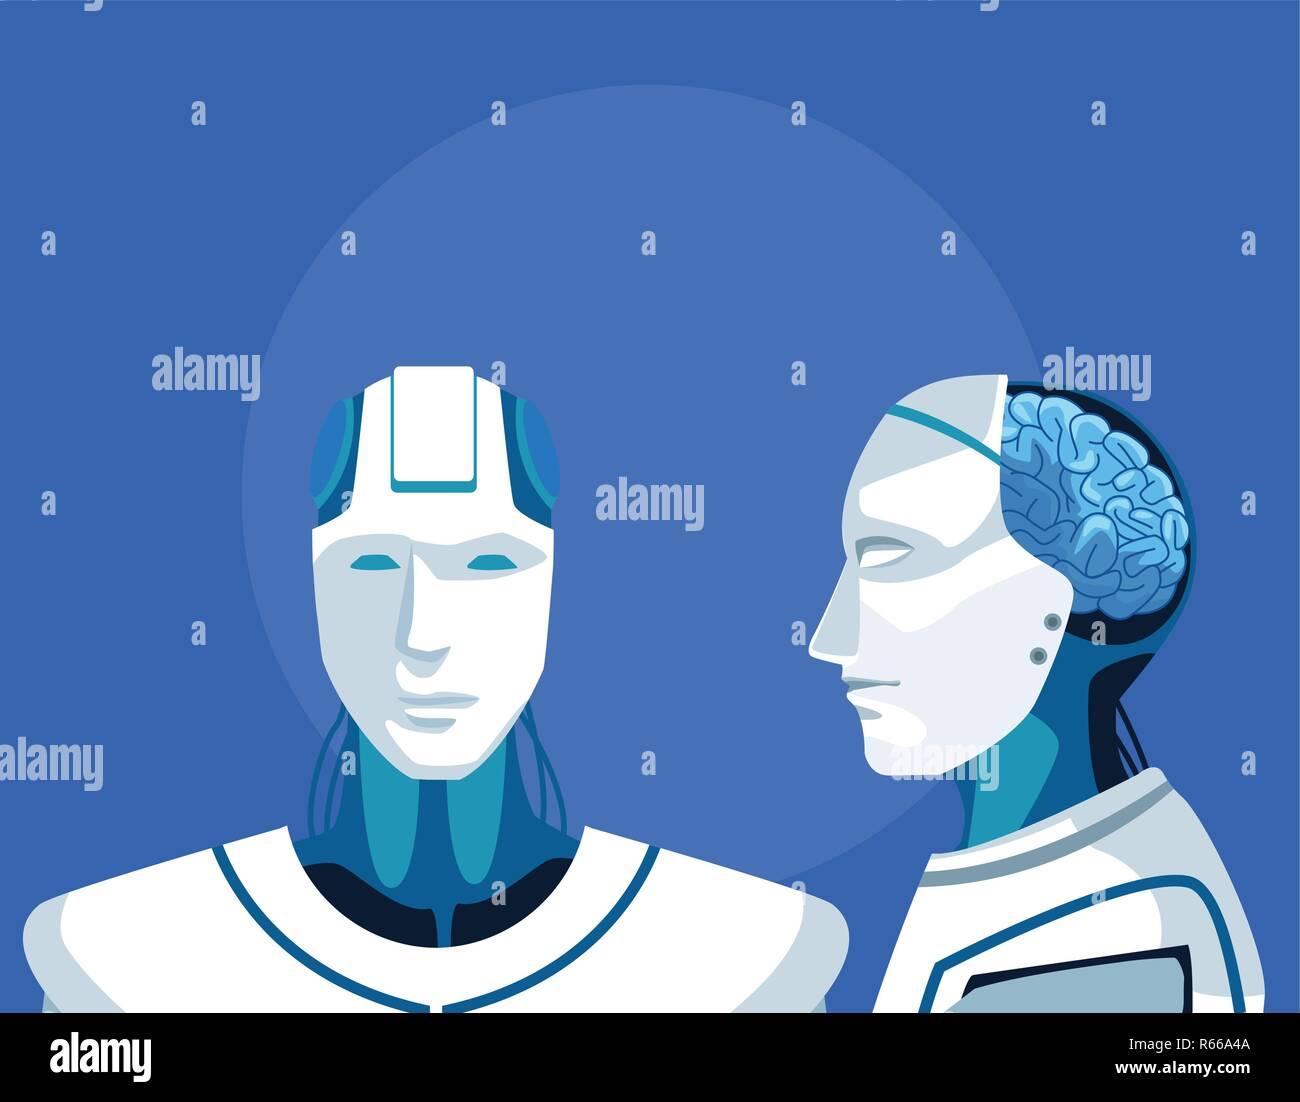 humanoid robot avatar - Stock Image